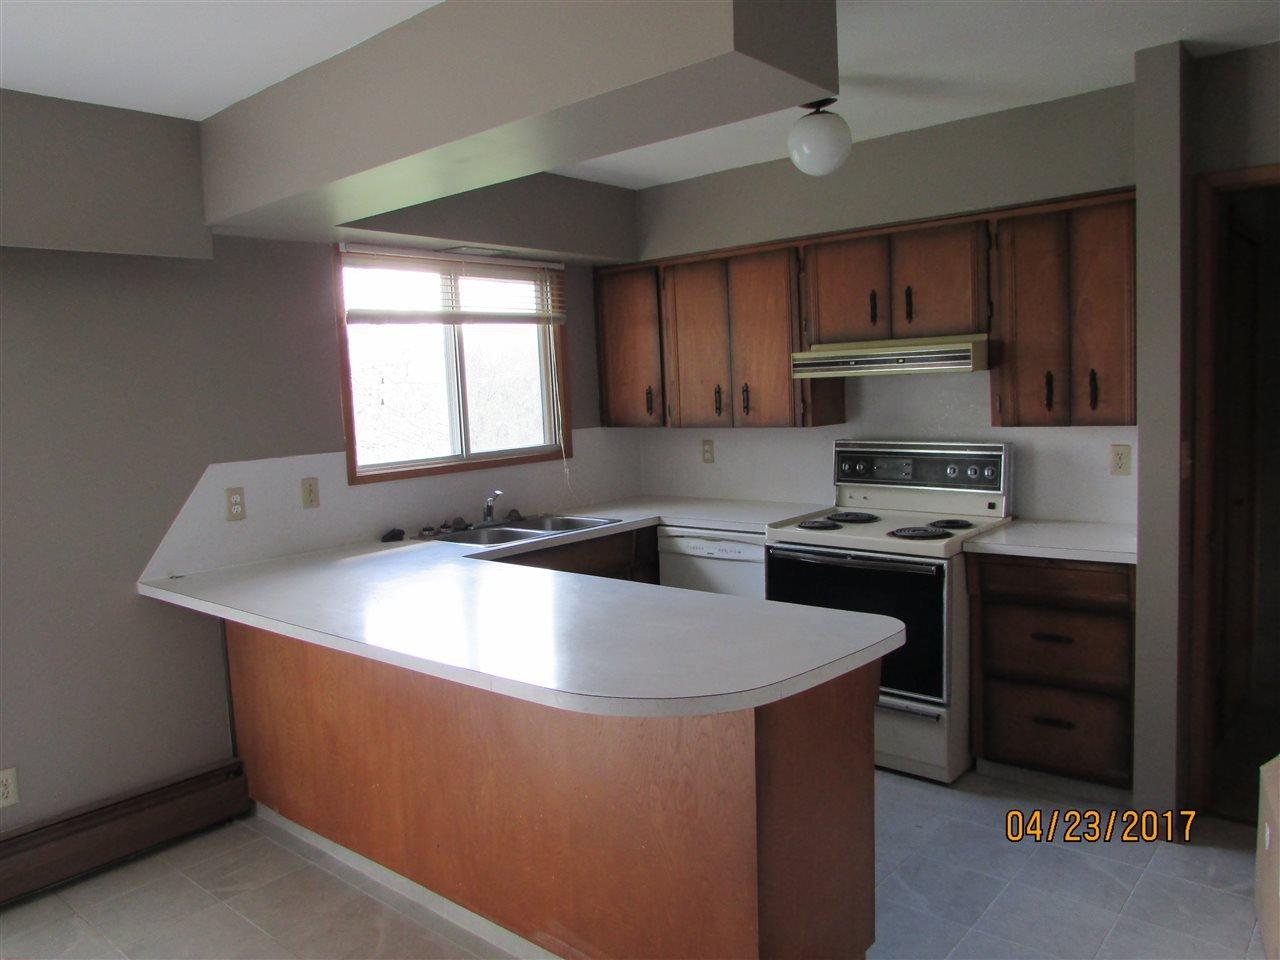 Photo 8: Photos: 7220 EVANS Road in Sardis: Sardis West Vedder Rd House for sale : MLS®# R2160379